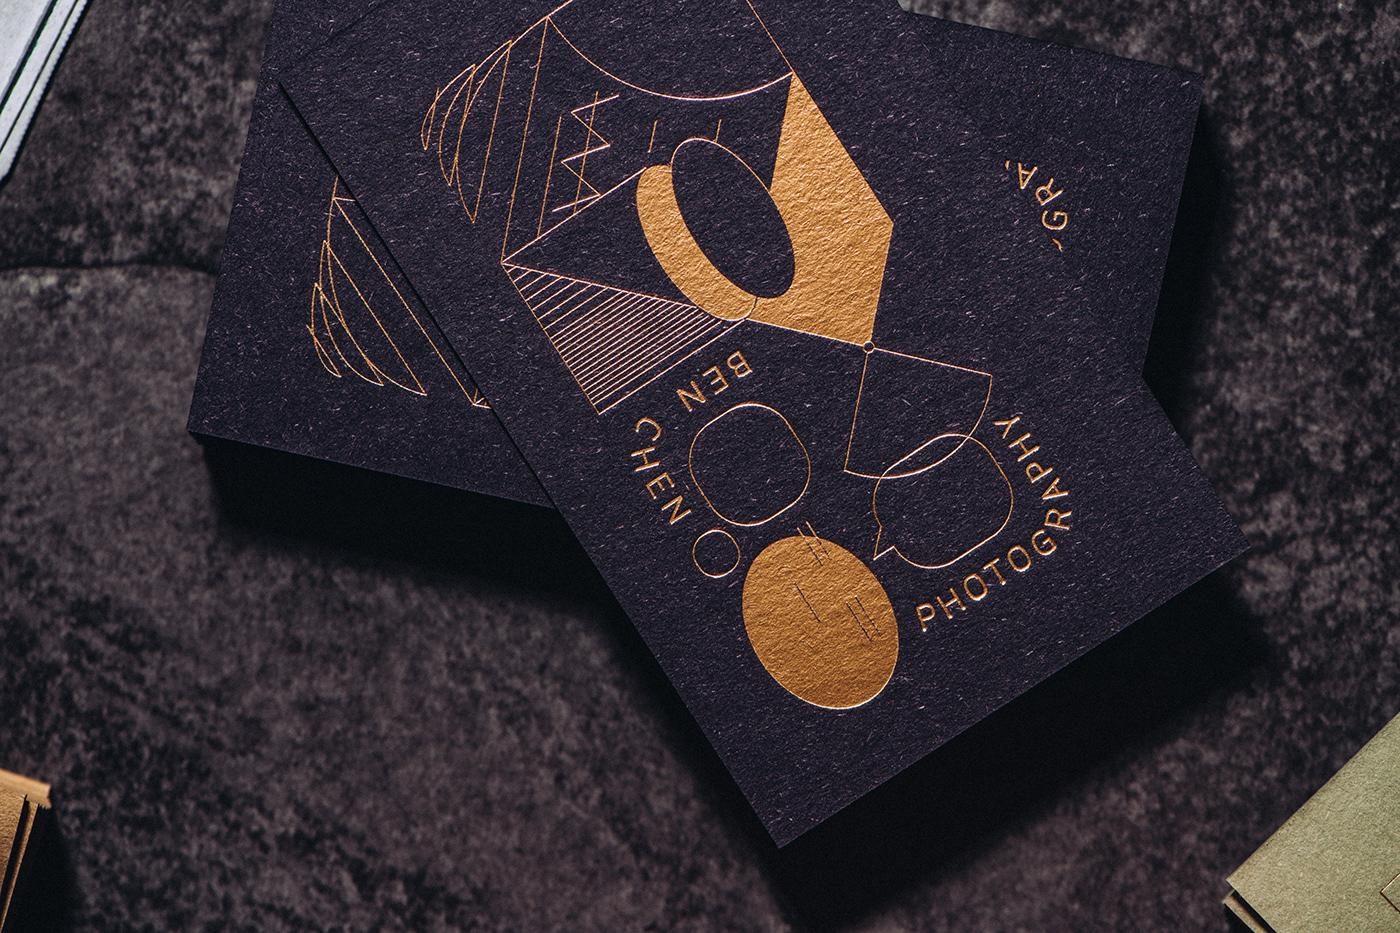 namecard,card,colorful,taiwan,Caotun,gold,letterpress,photo,benchen,sionhsu